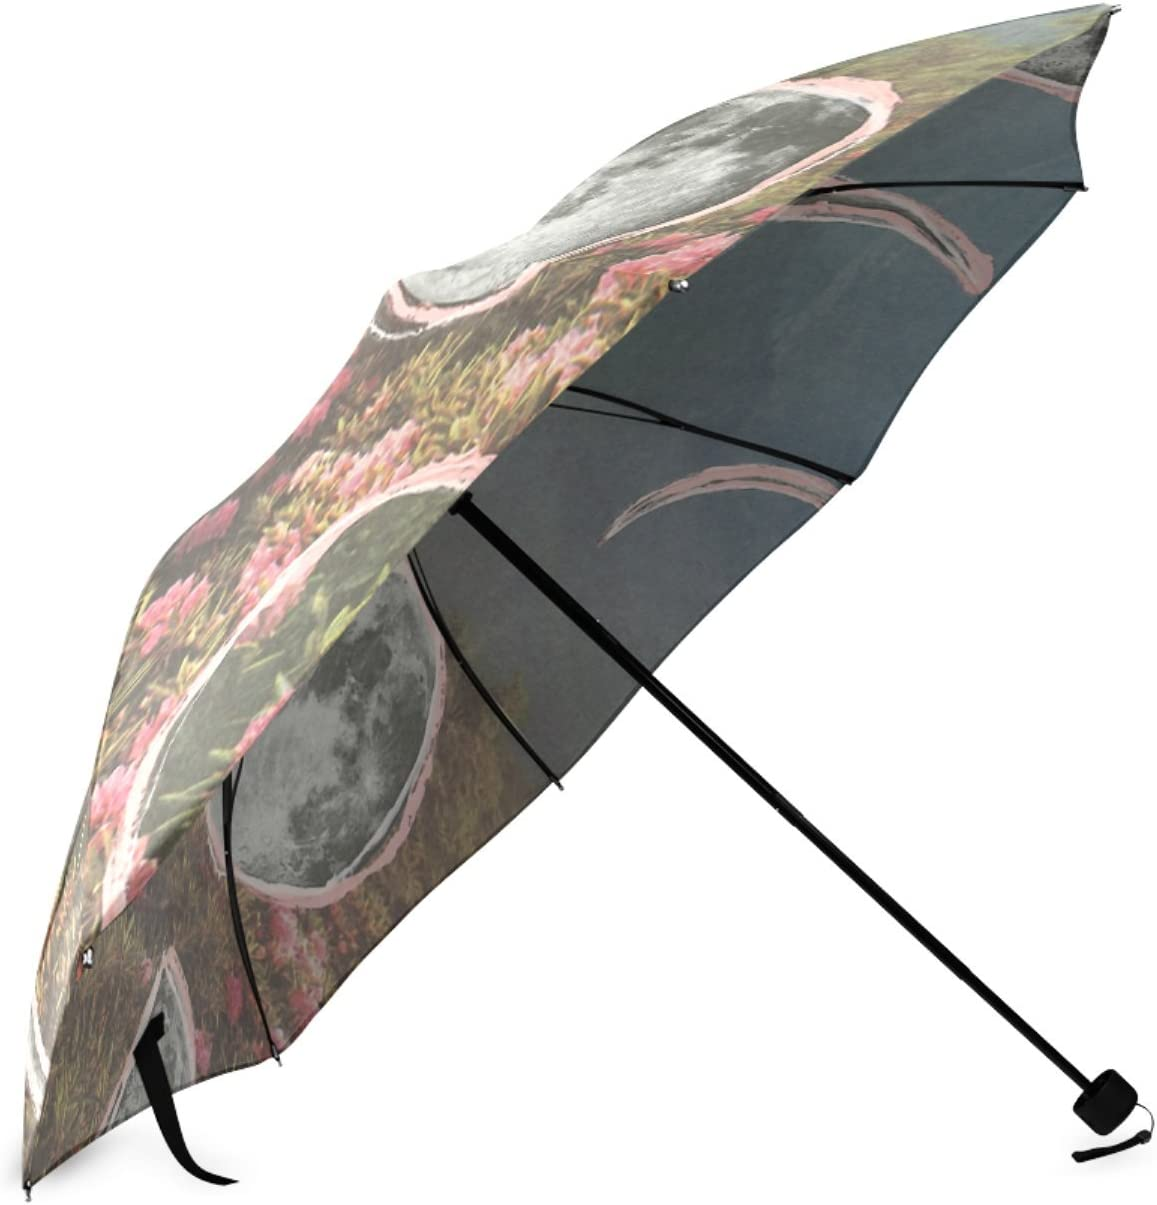 Personalized He Makes All Things New Custom Foldable Sun Rain Umbrella